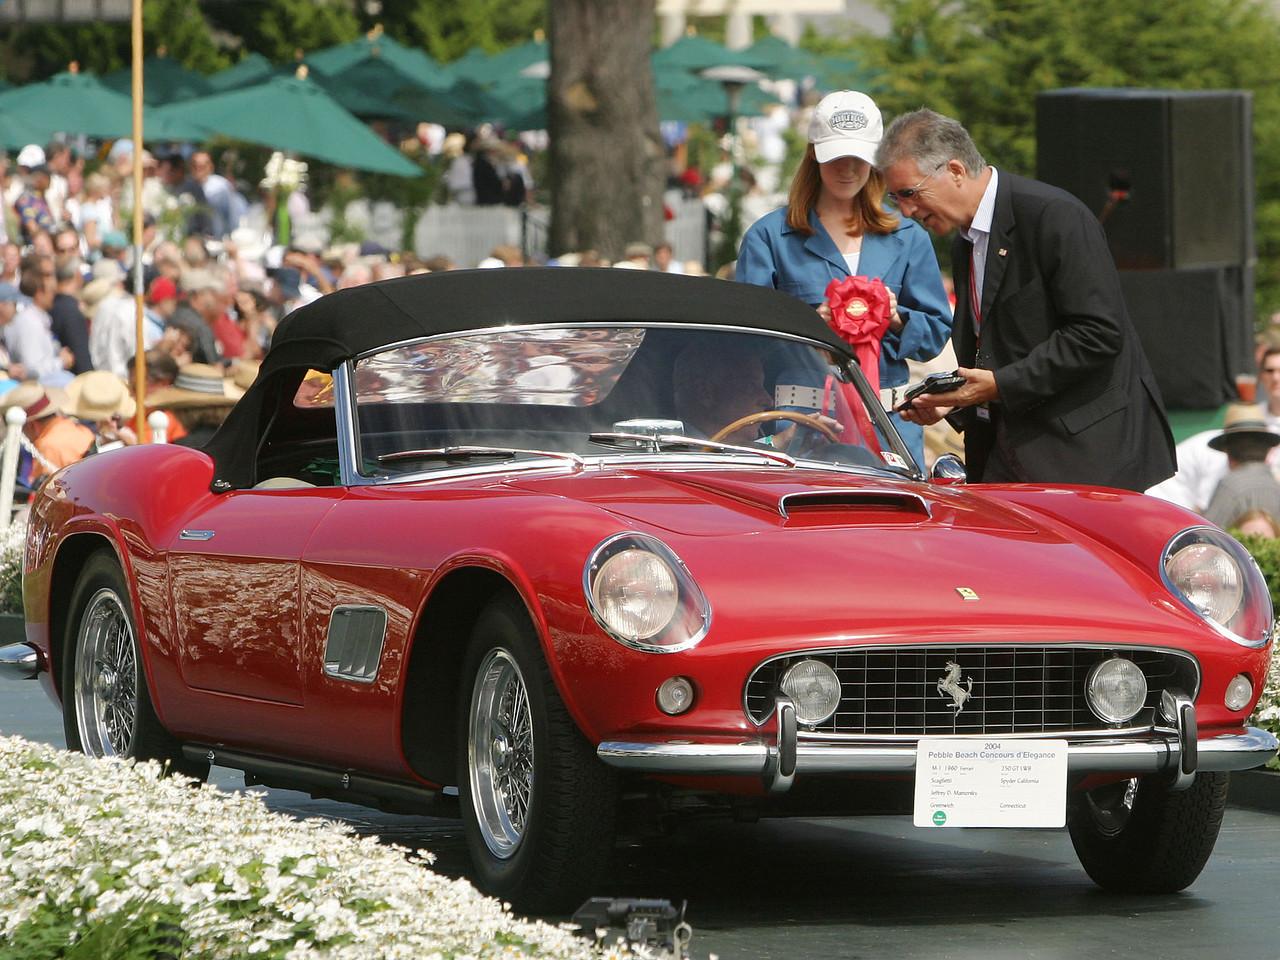 1960 Ferrari 250 GT LWB Scaglietti Spyder California. 2nd Ferrari Open.  Jeffrey D. Mamorsky.